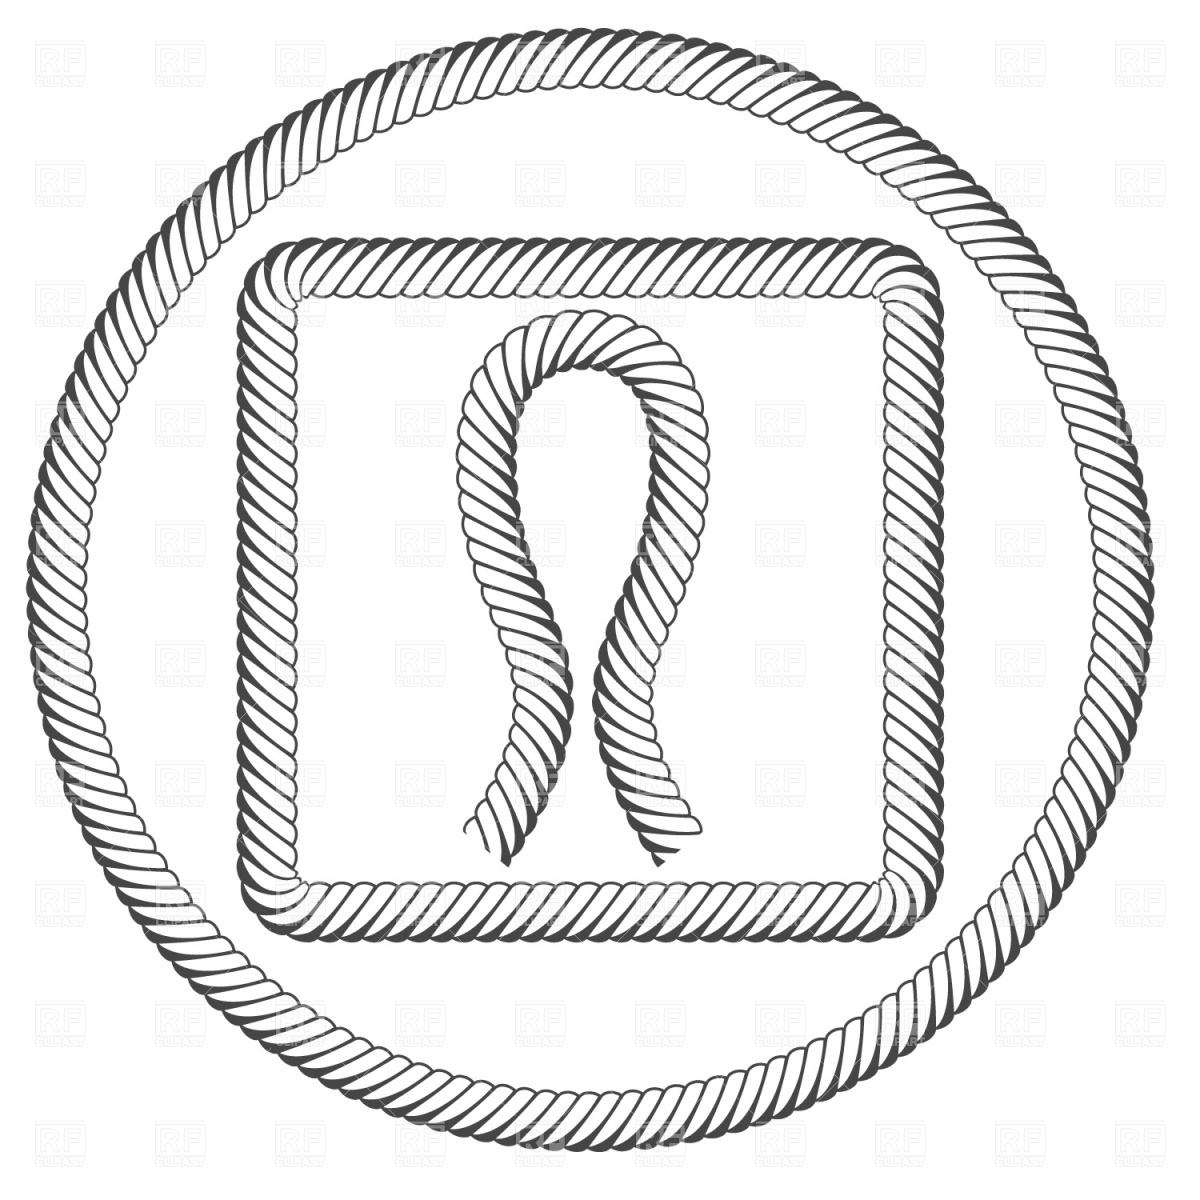 Drawn rope ring vector Border Free Clipart Clip Art